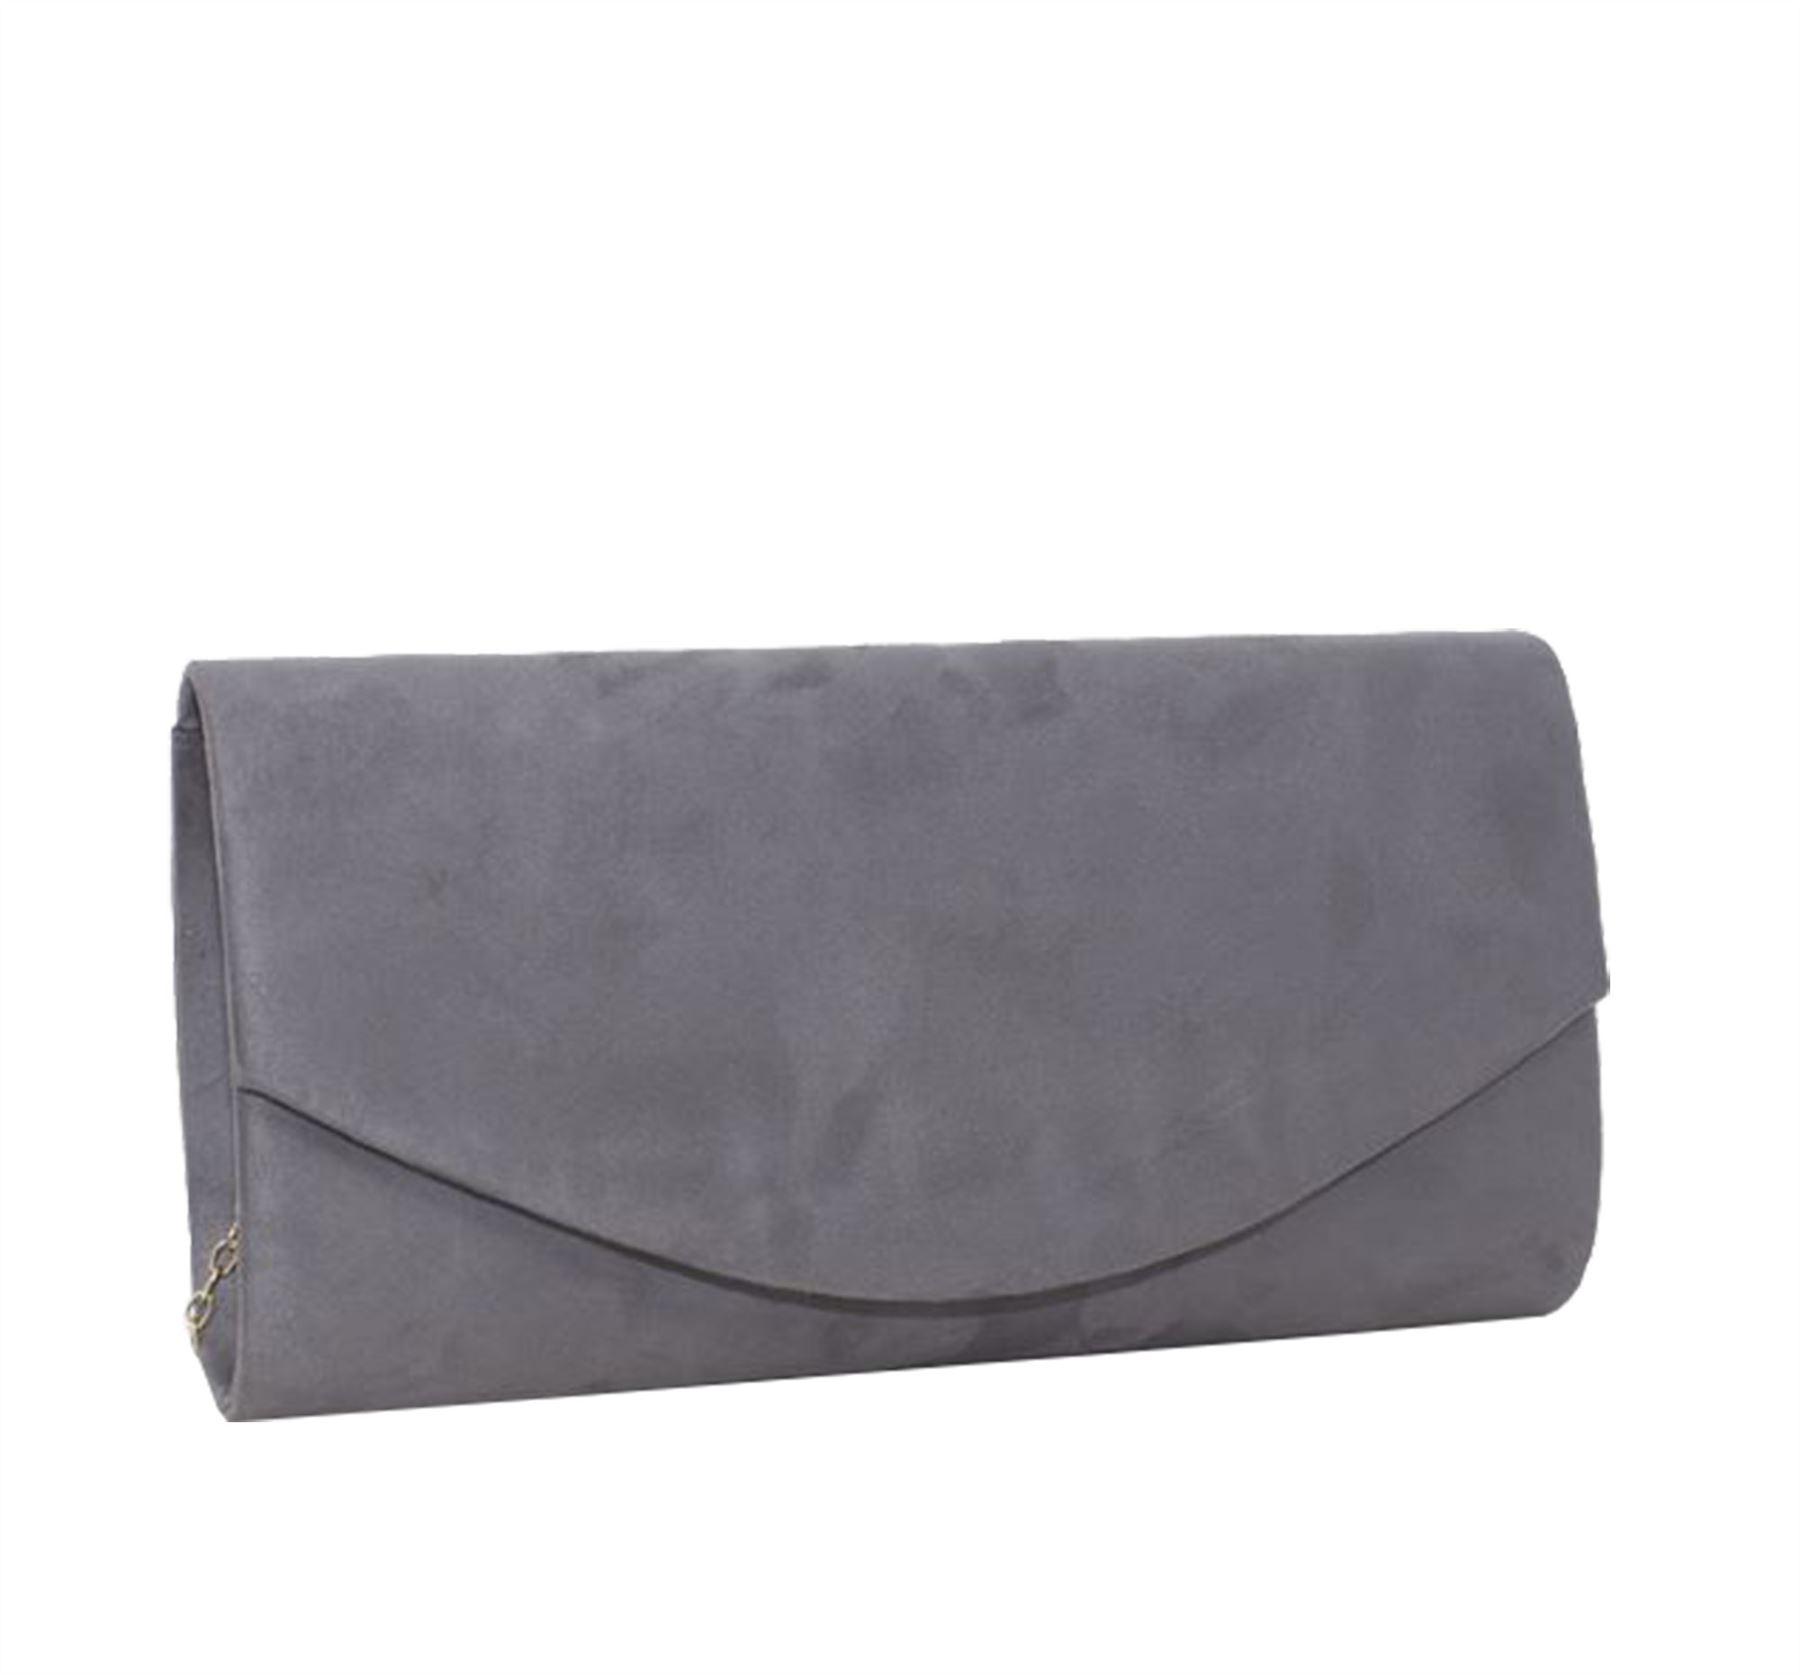 c4422942b6a6a New Velvet Simple Plain Women's Party Evening clutch Bag Purse | eBay